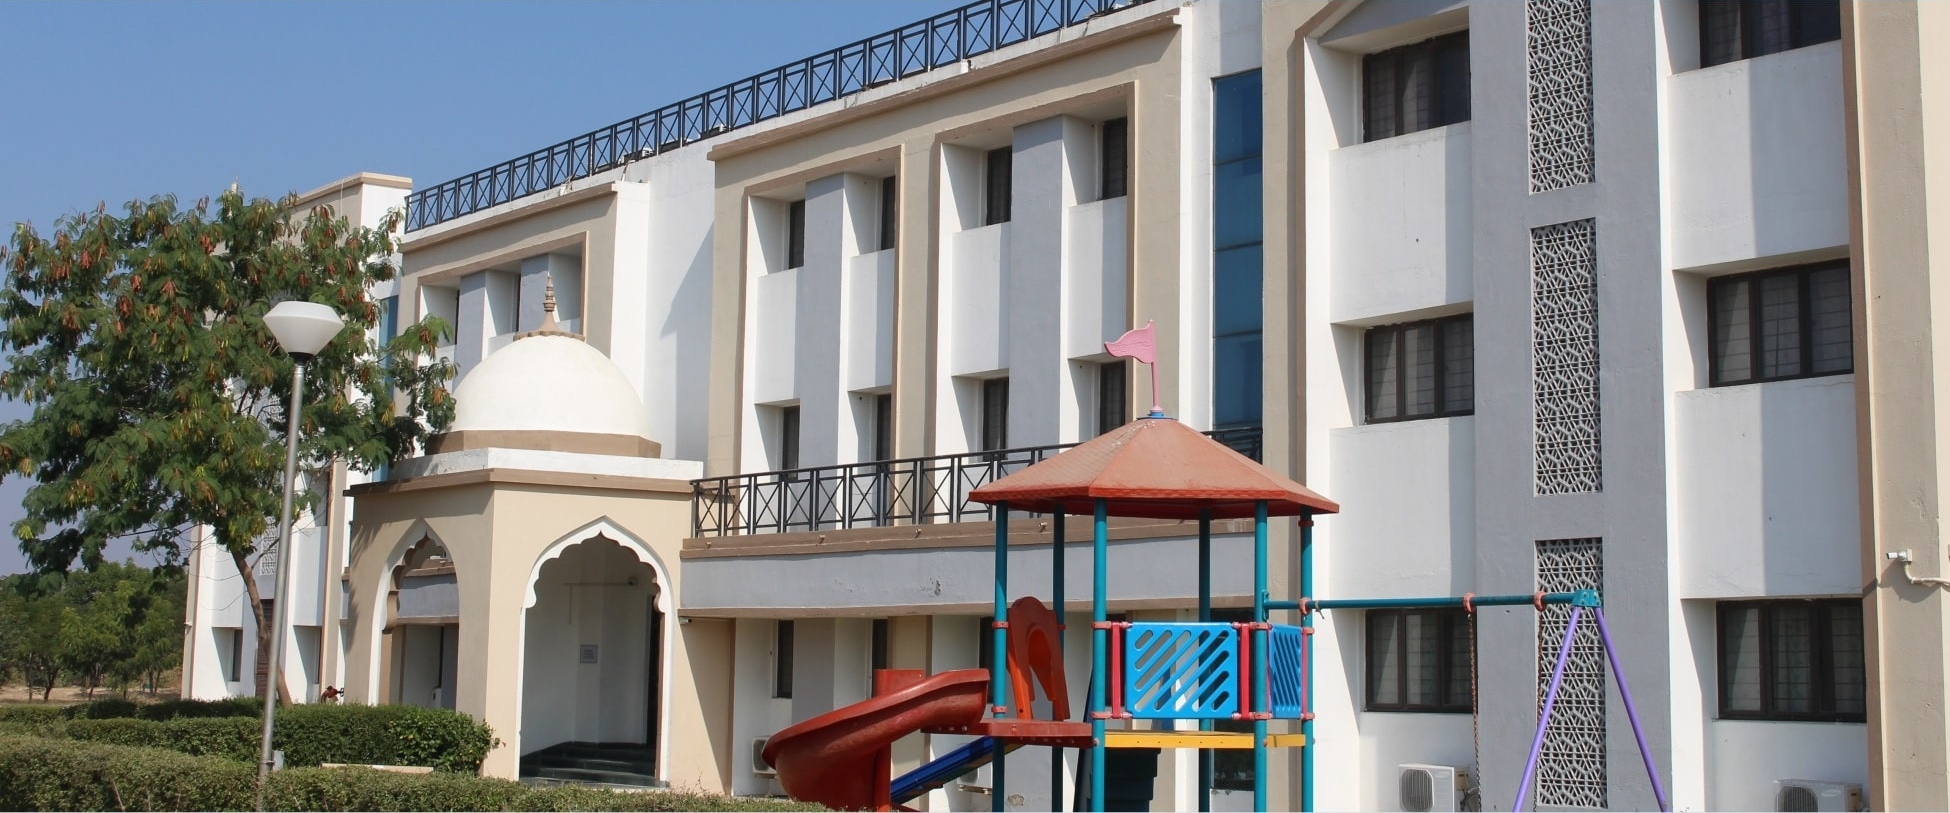 Birla hostel 02